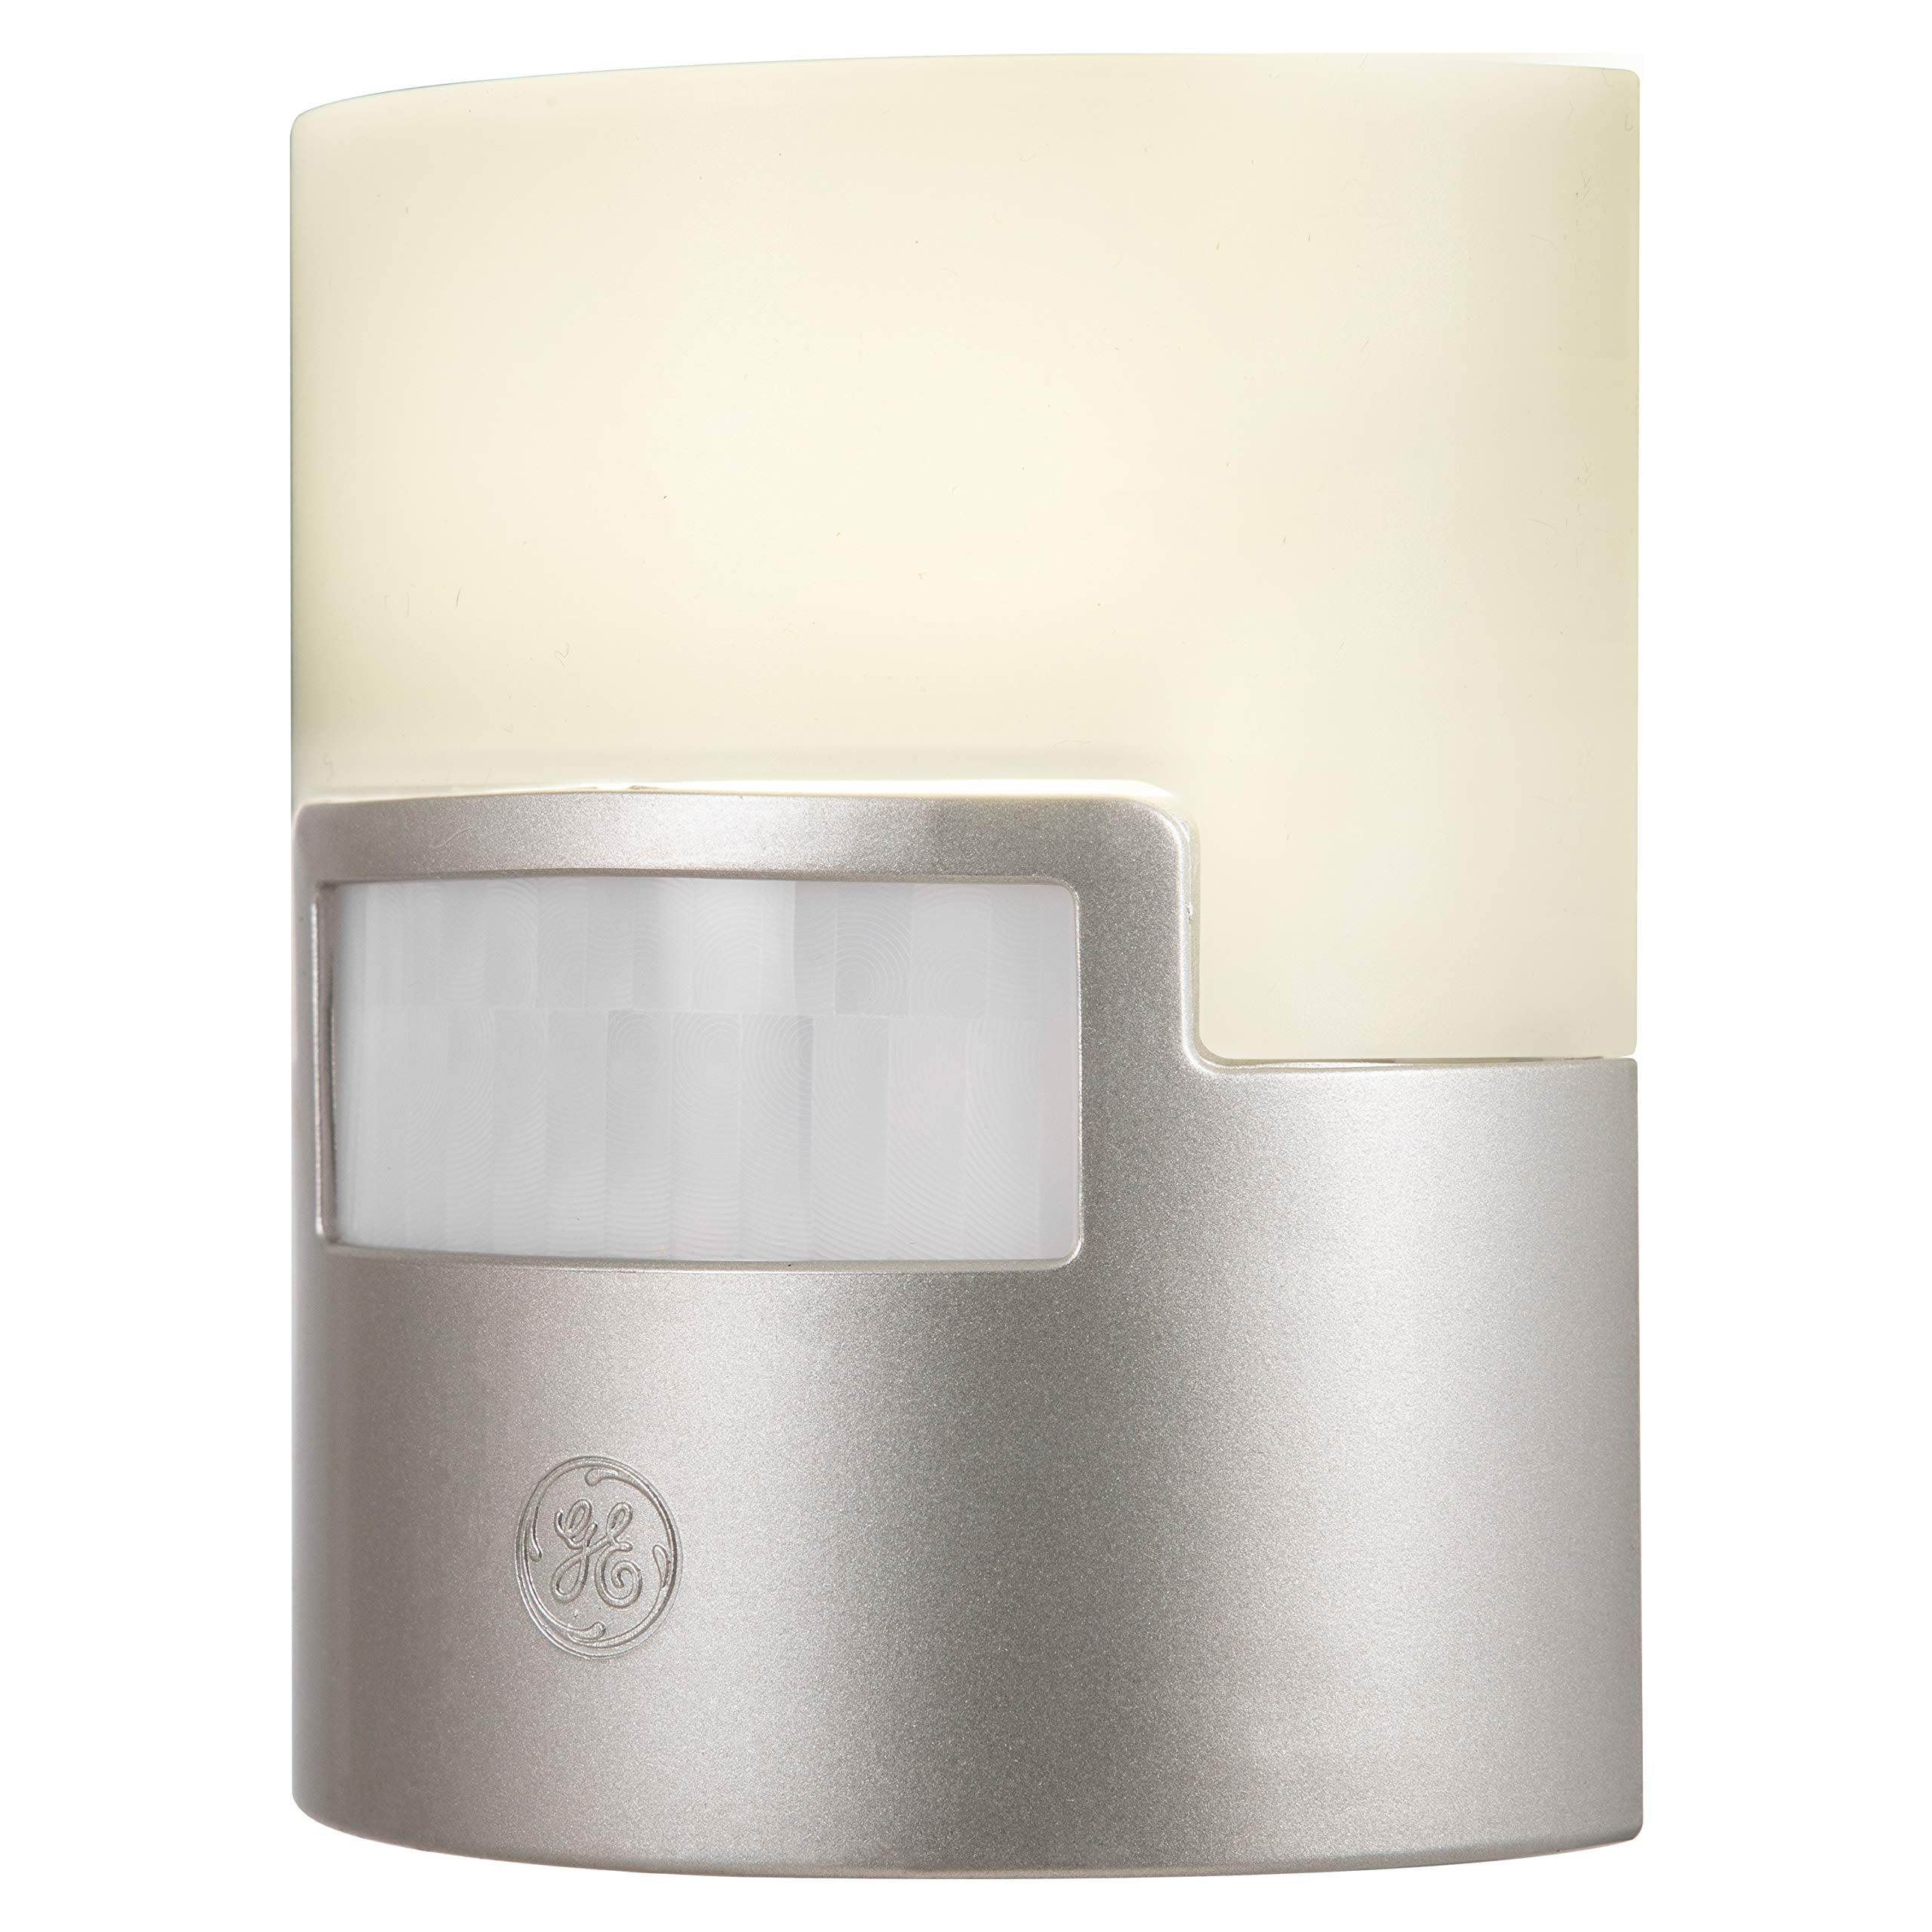 GE Silver LED Night Light